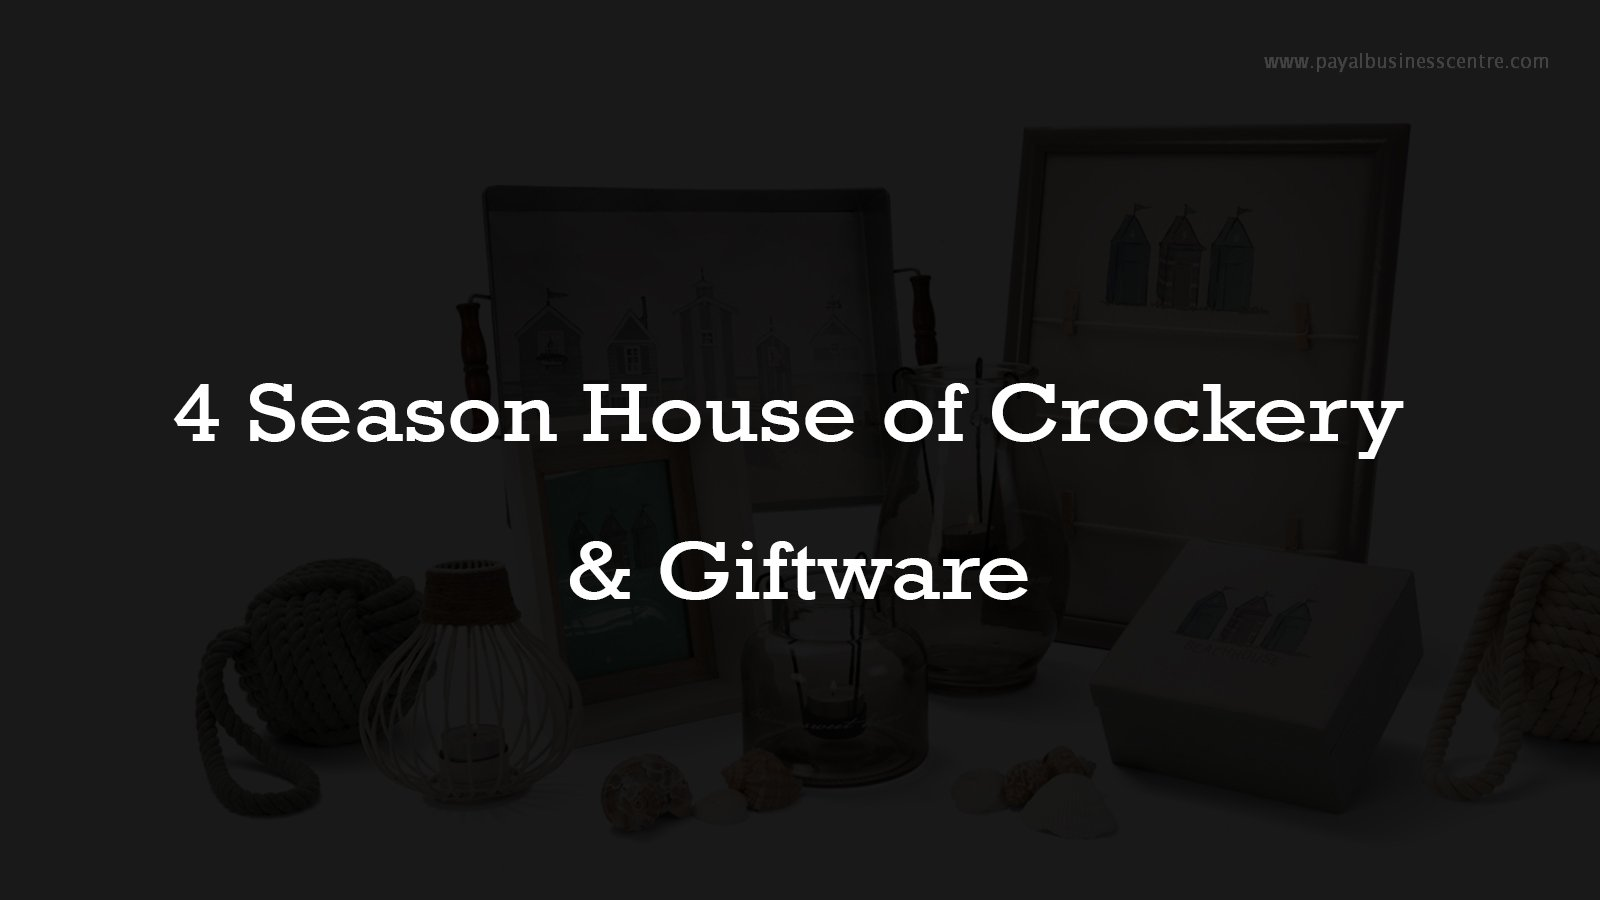 4 Season House of Crockery & Giftware - Home Decor - 8148 128 St